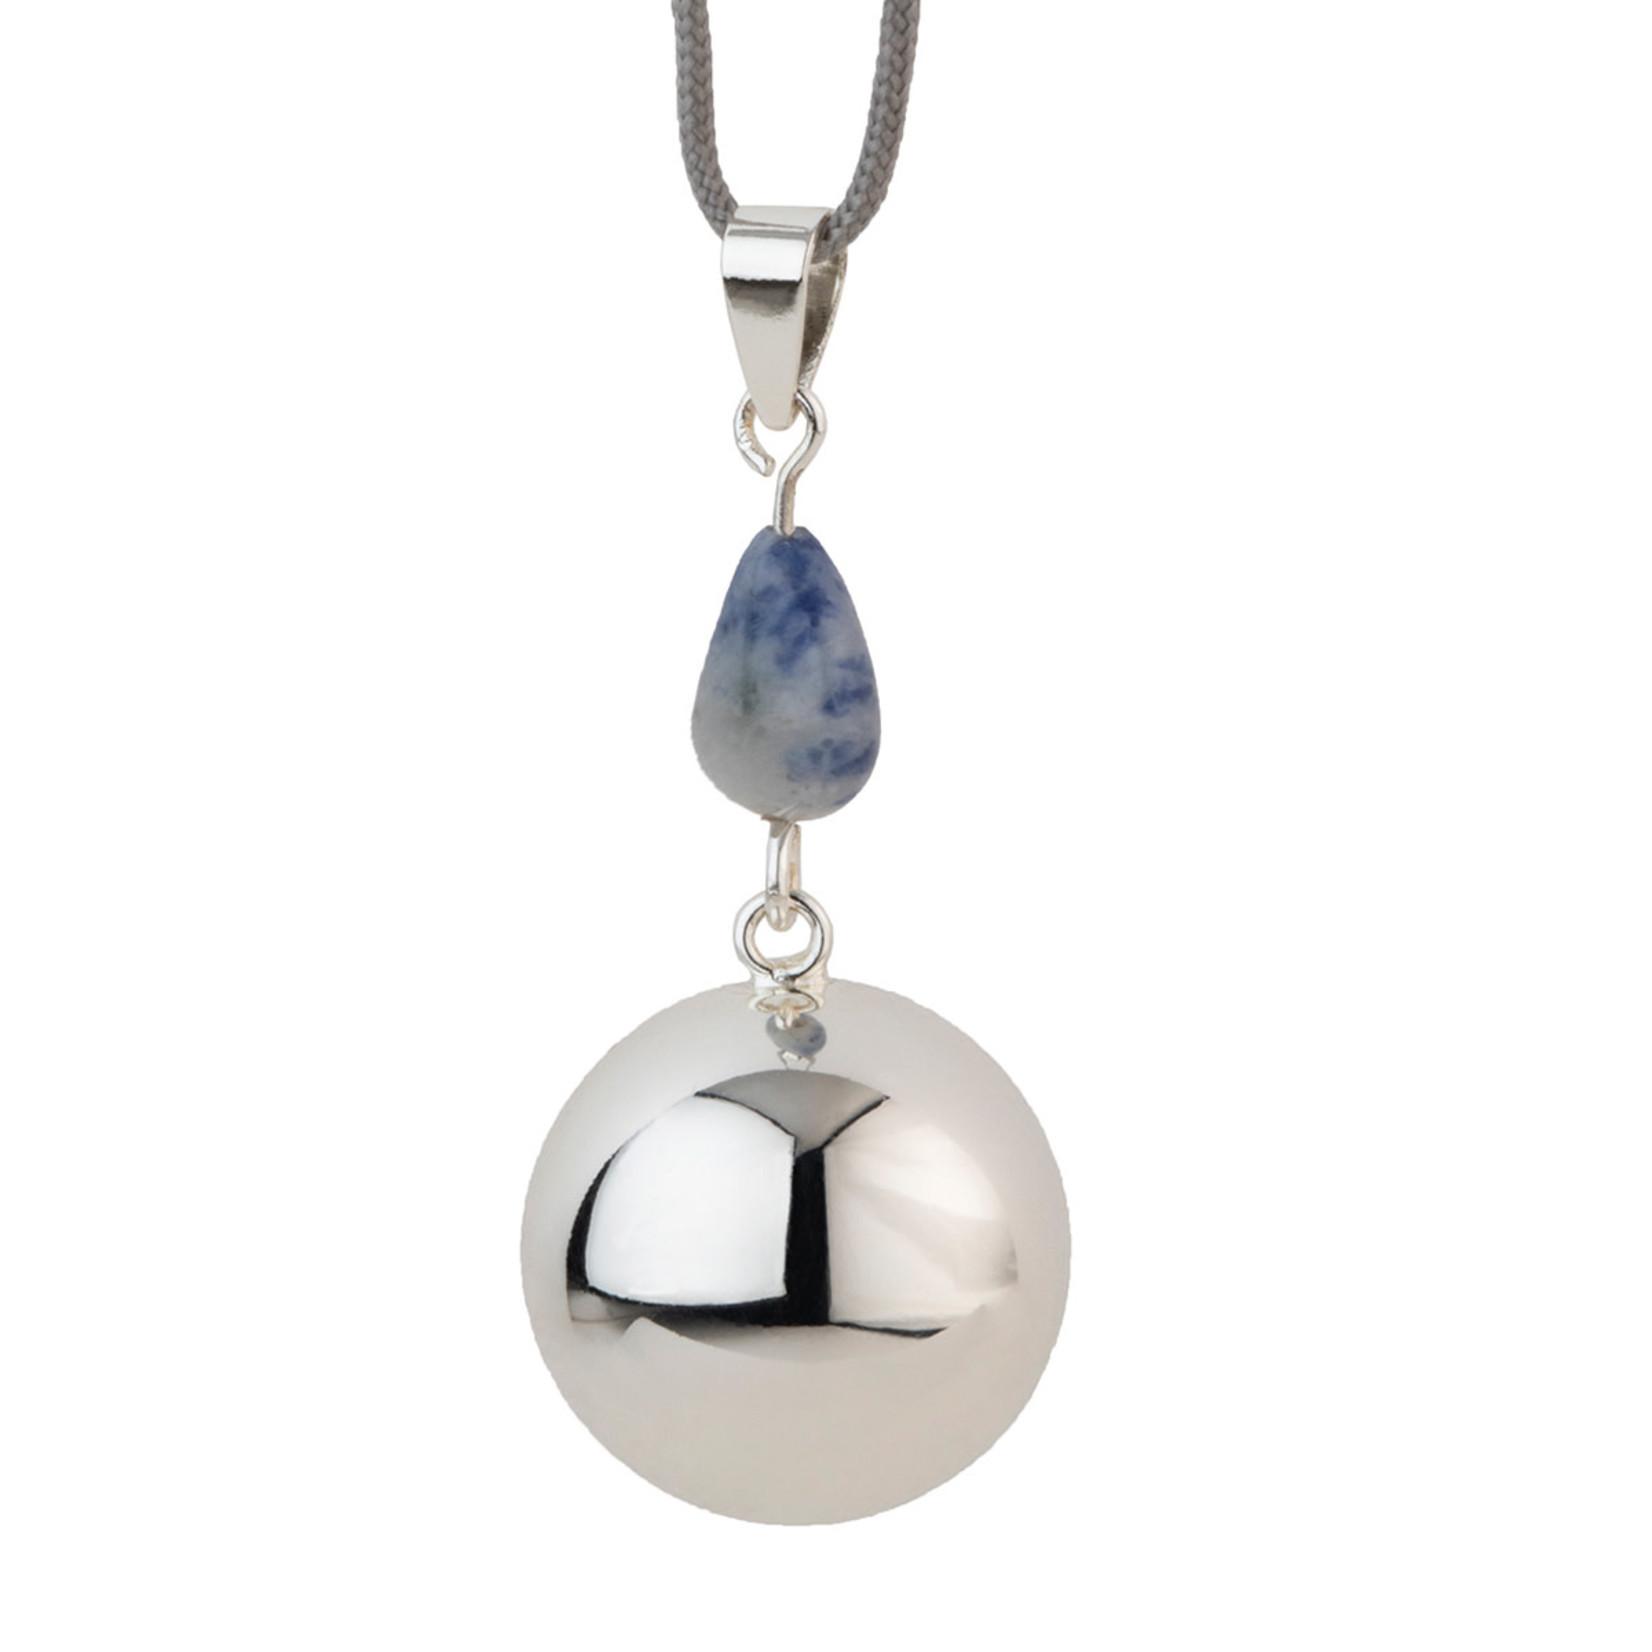 Bola Bola - Babylonia Bola - Silver bluegrey stone - One size